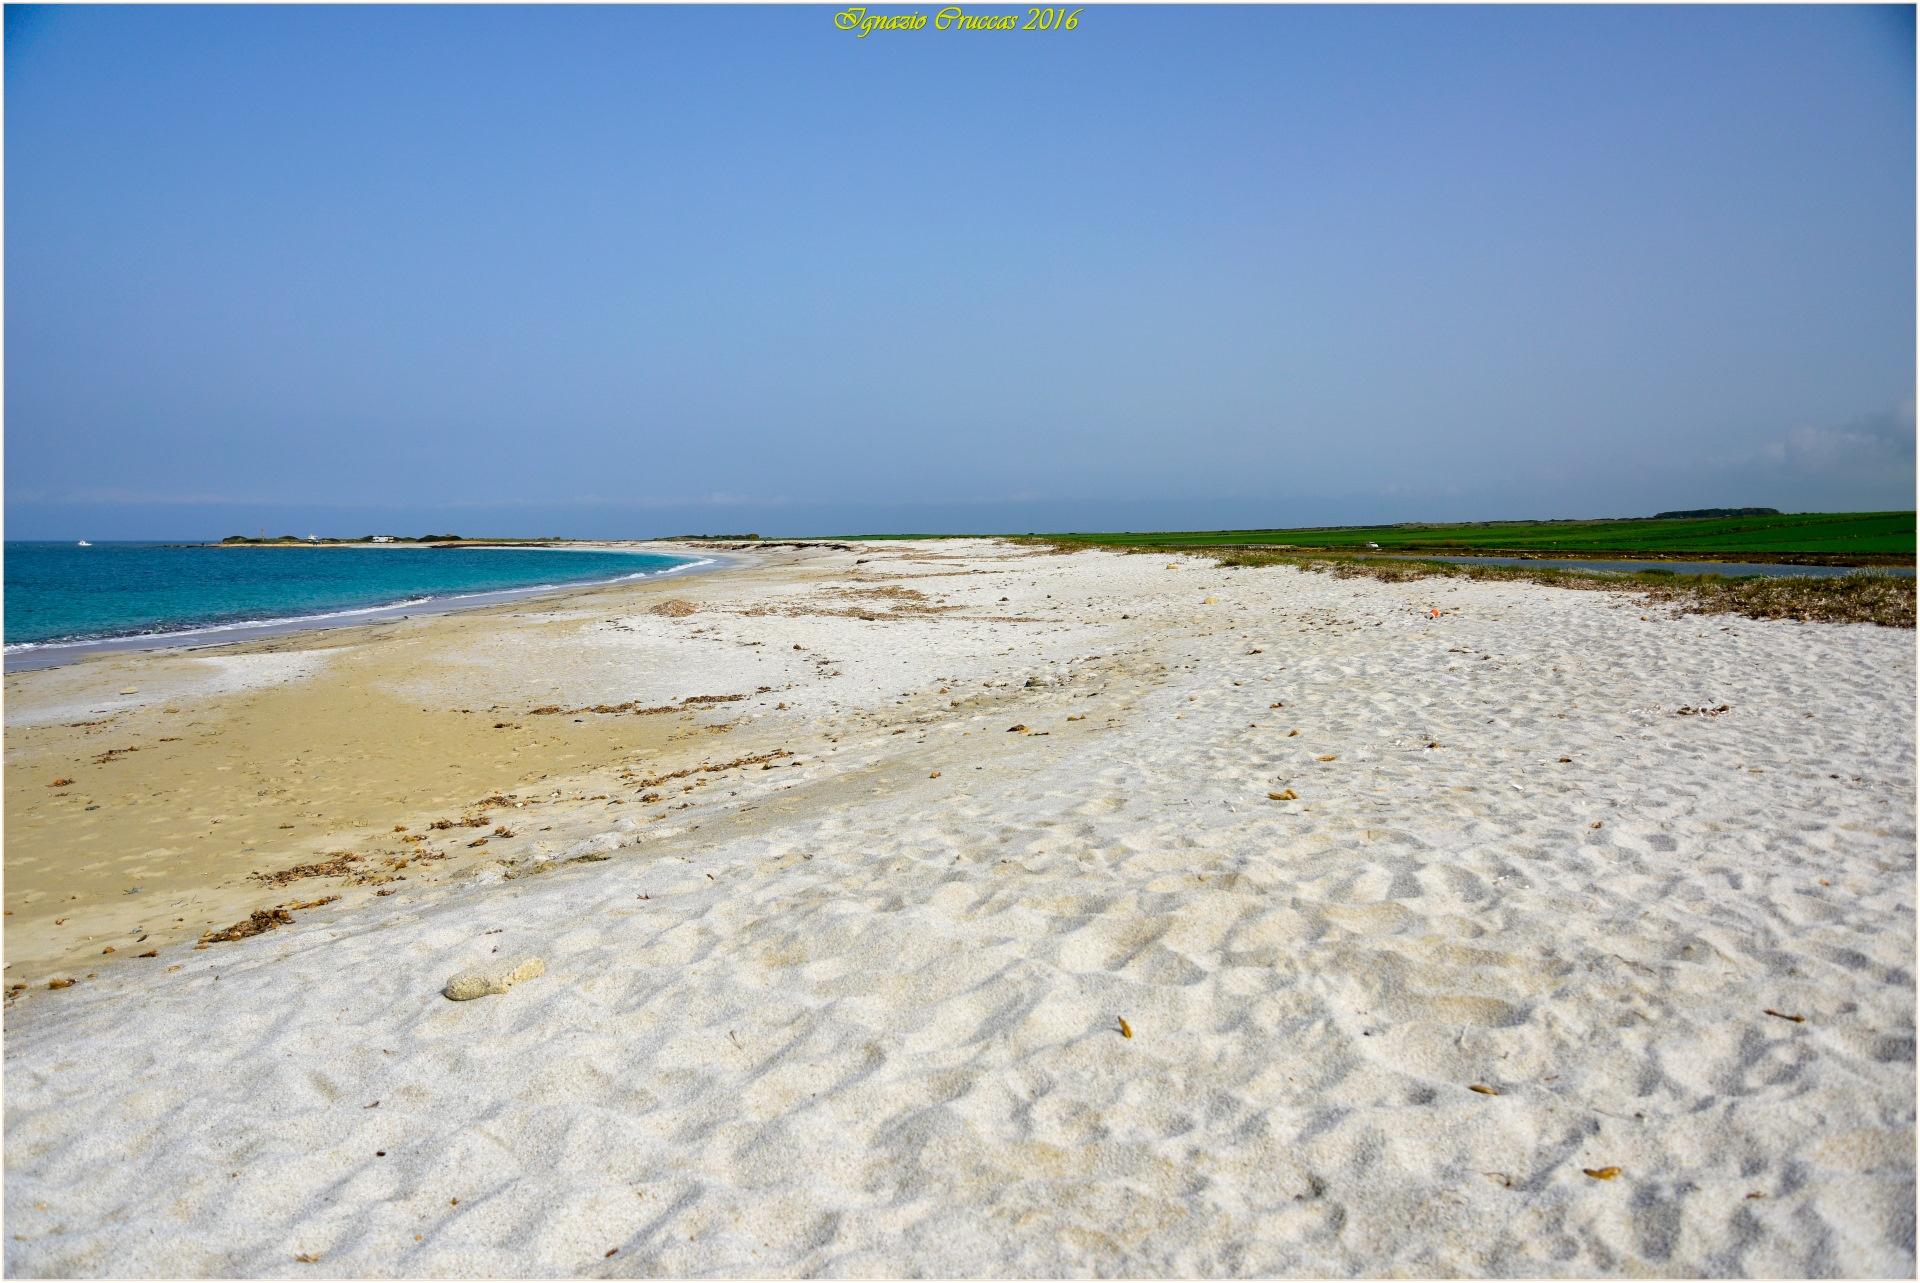 White sand by ignazio cruccas